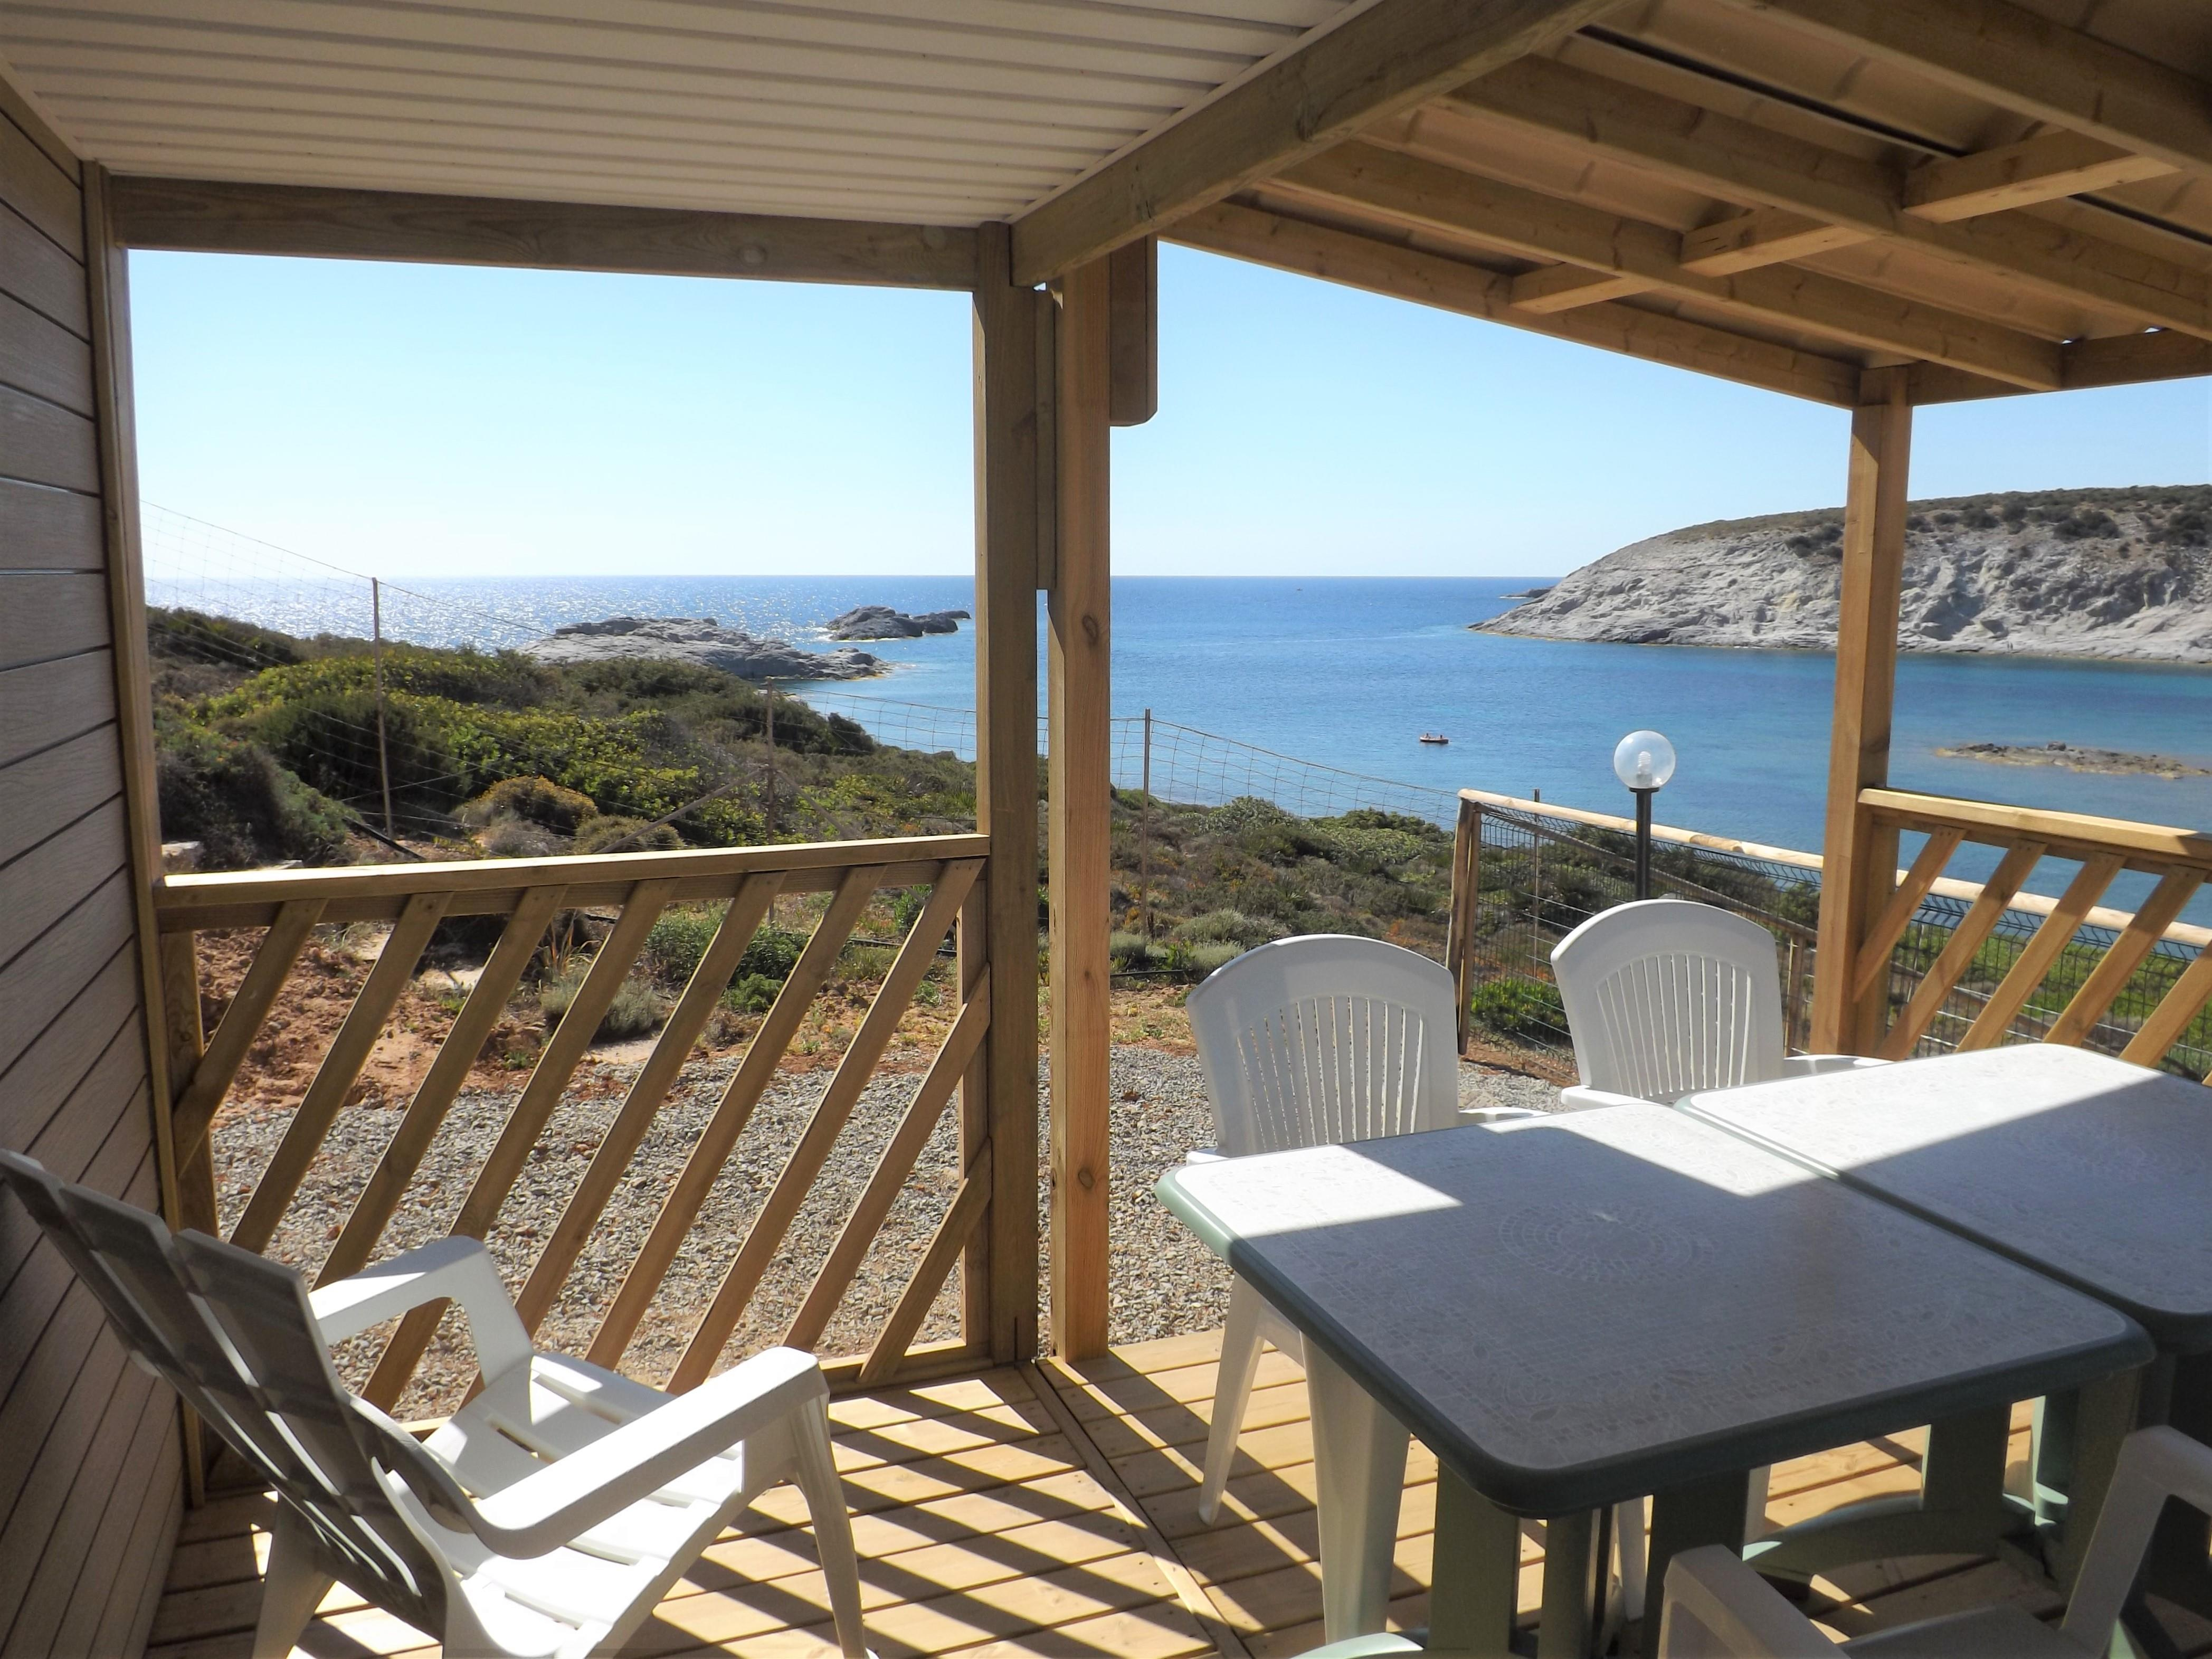 Location - Mobilehome Elba Avec Vue Sur La Mer - Camping Tonnara